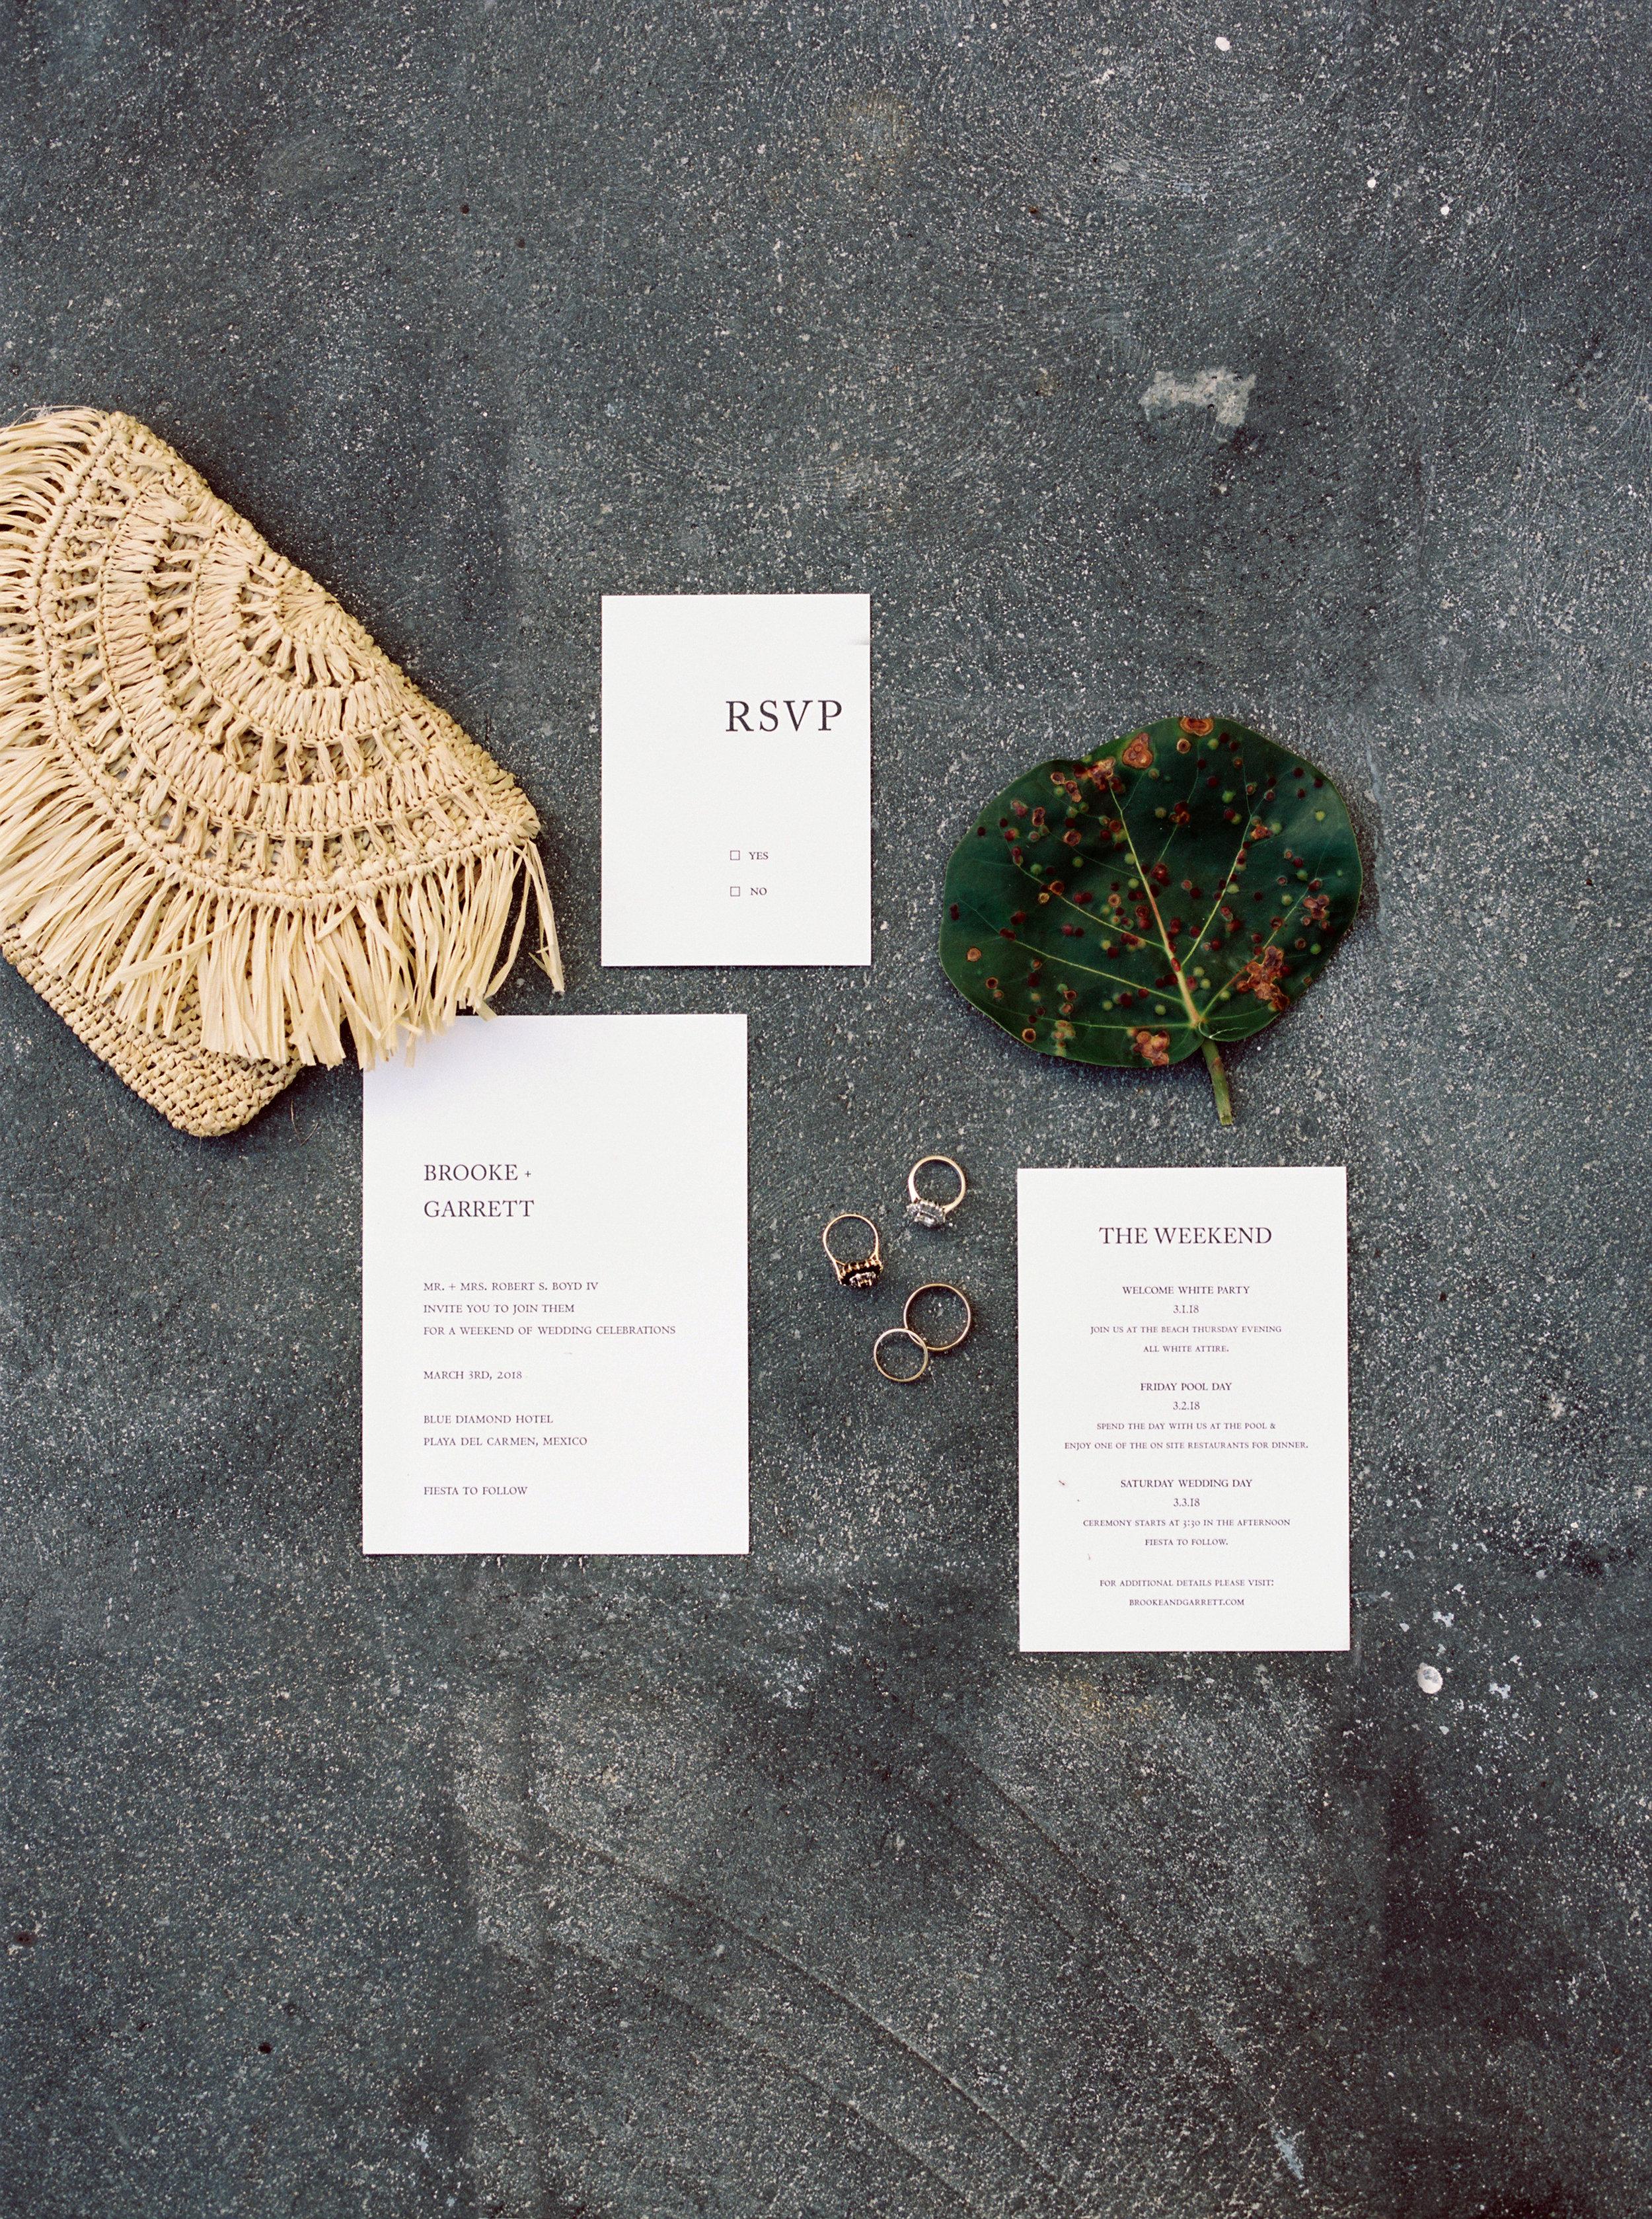 Kyle John l Fine Art Wedding Photography l Chicago, Copenhagen, California, New York, Destination l Blog l Brooke Boyd_The Film Poets_Tulum Wedding_10